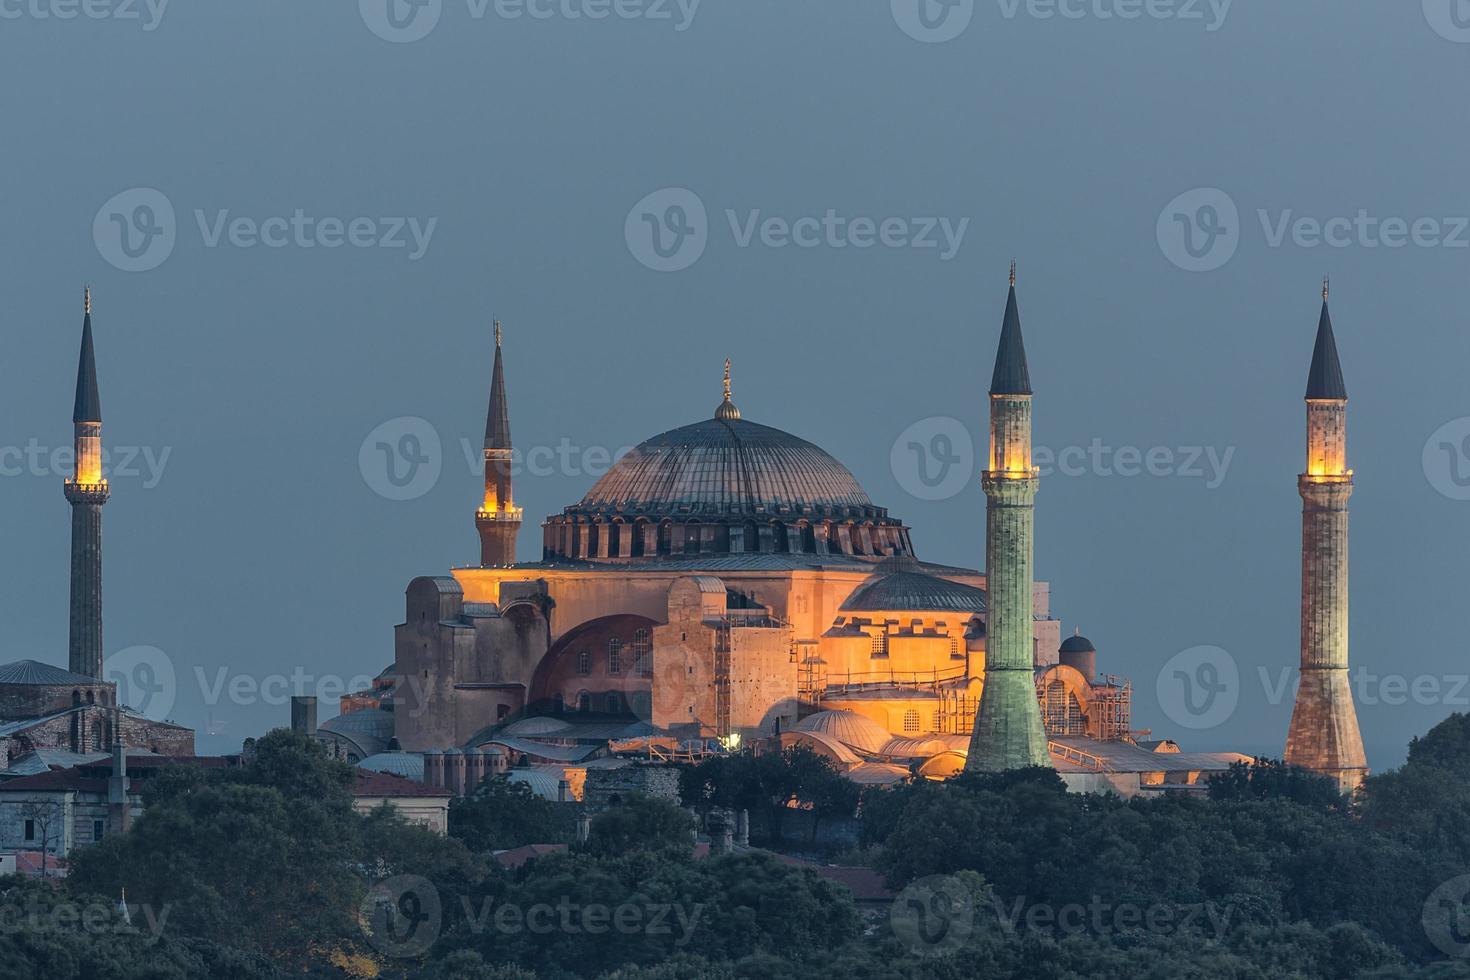 Istanbul - Hagia Sophia enlightened by night photo